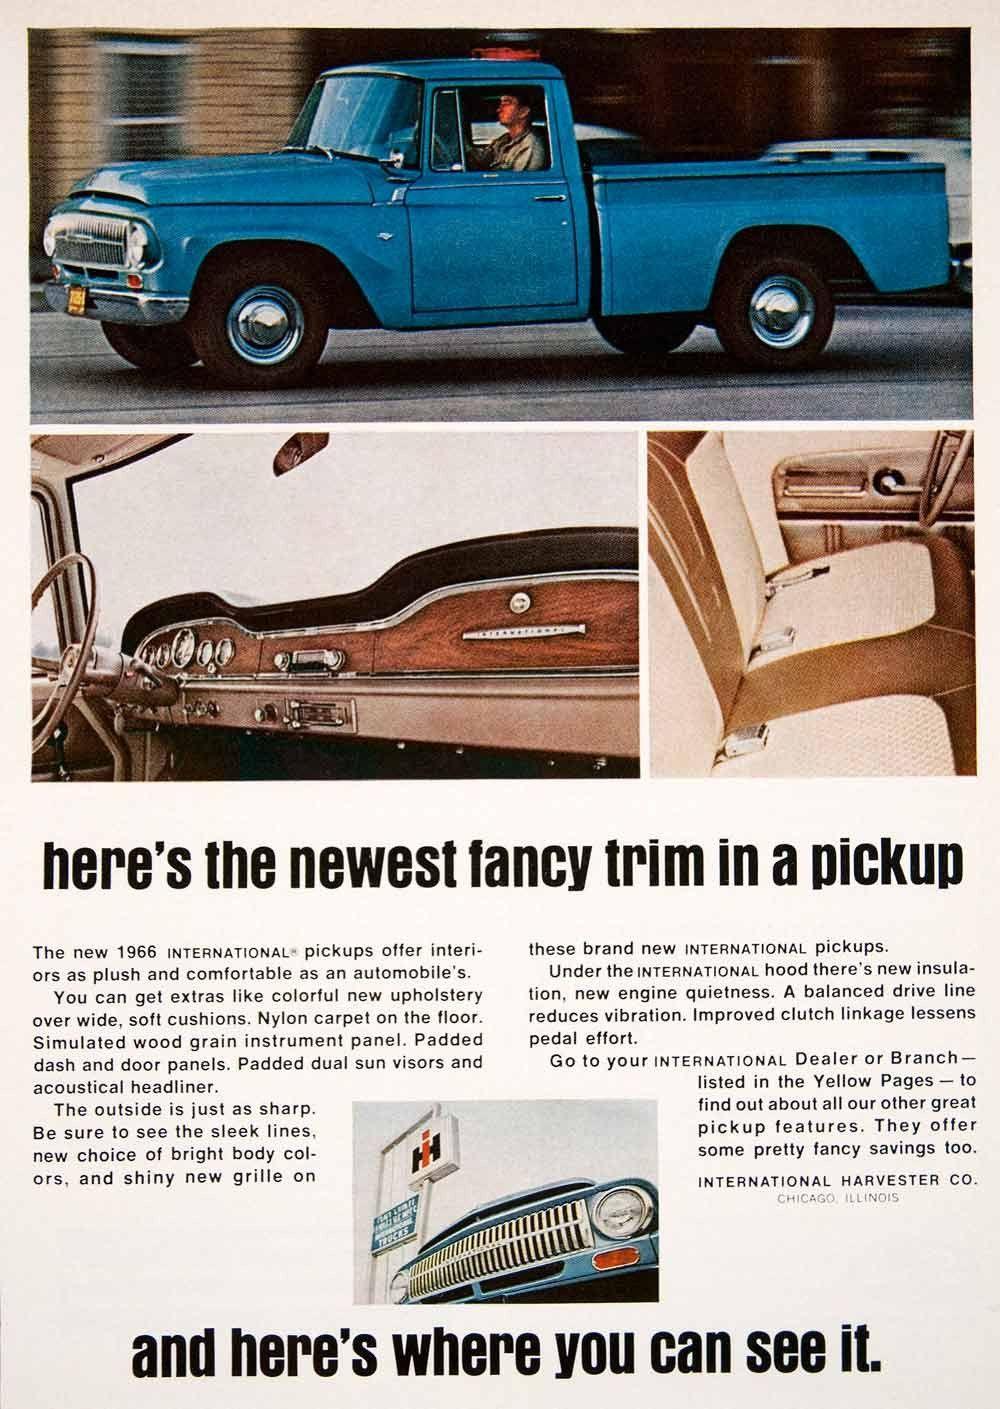 1966 Ad Pickup Truck International Harvester Chicago Illinois Automobile Sf1 Pickup Trucks International Harvester International Pickup Truck